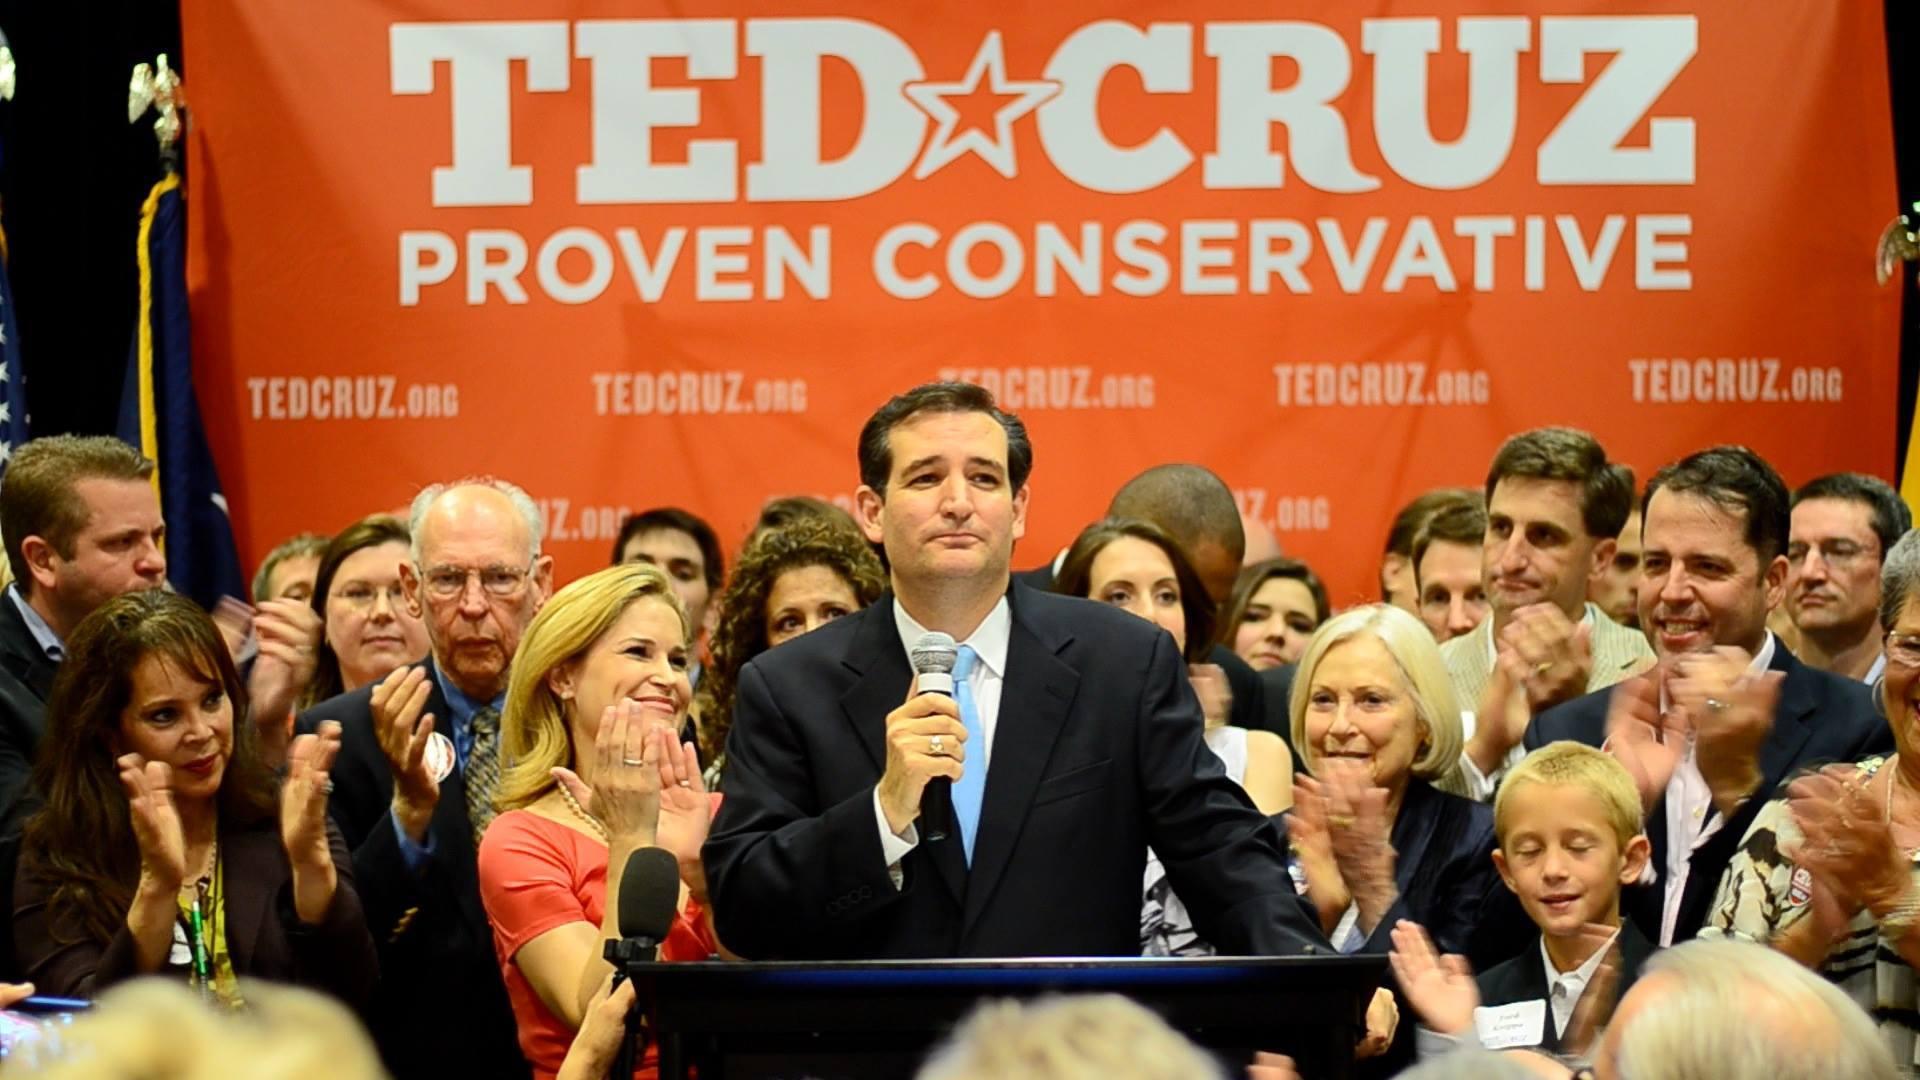 Ted Cruz Wallpapers HD